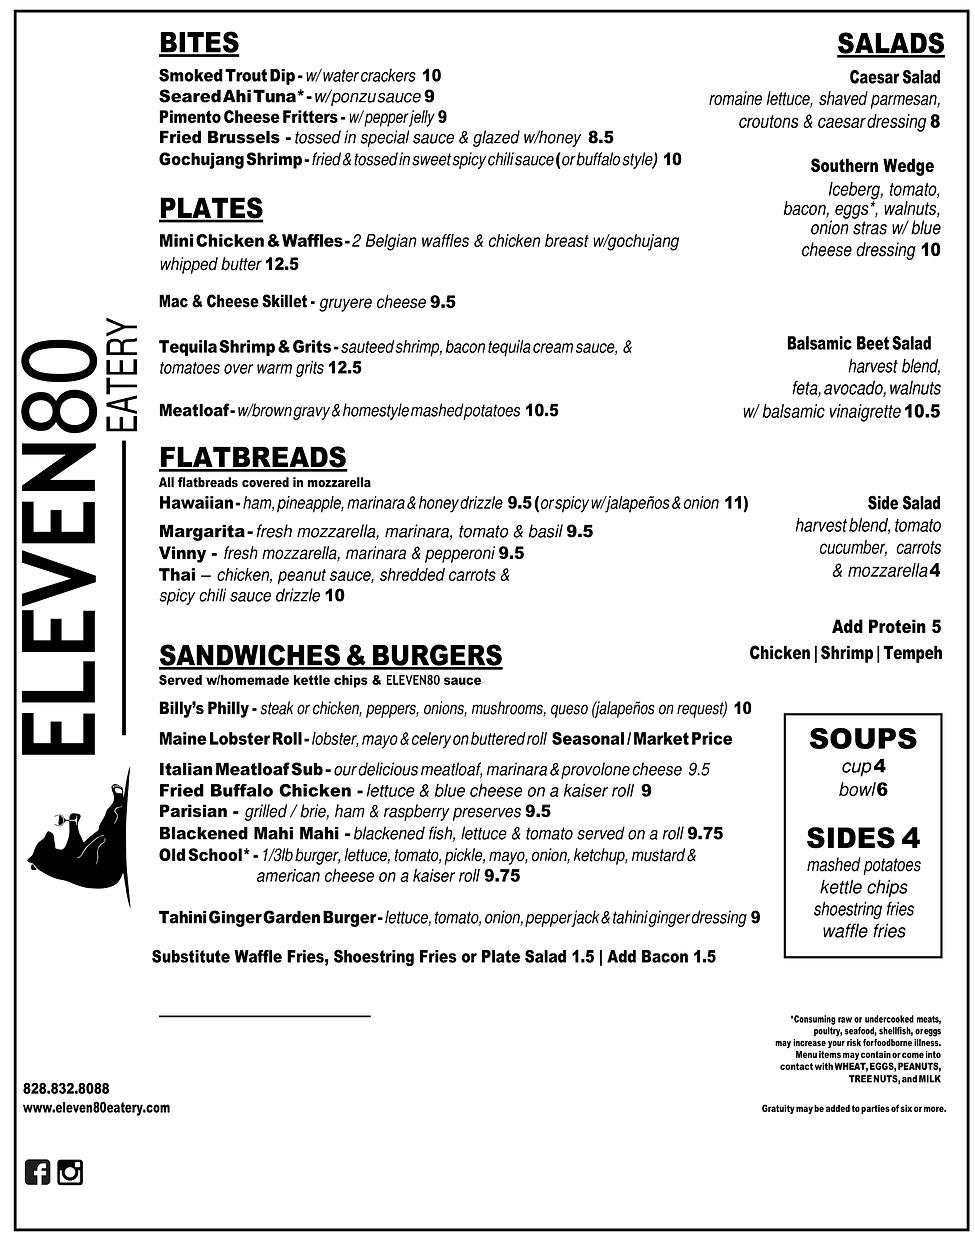 updated_menu_9.20_v_2-1[1].png